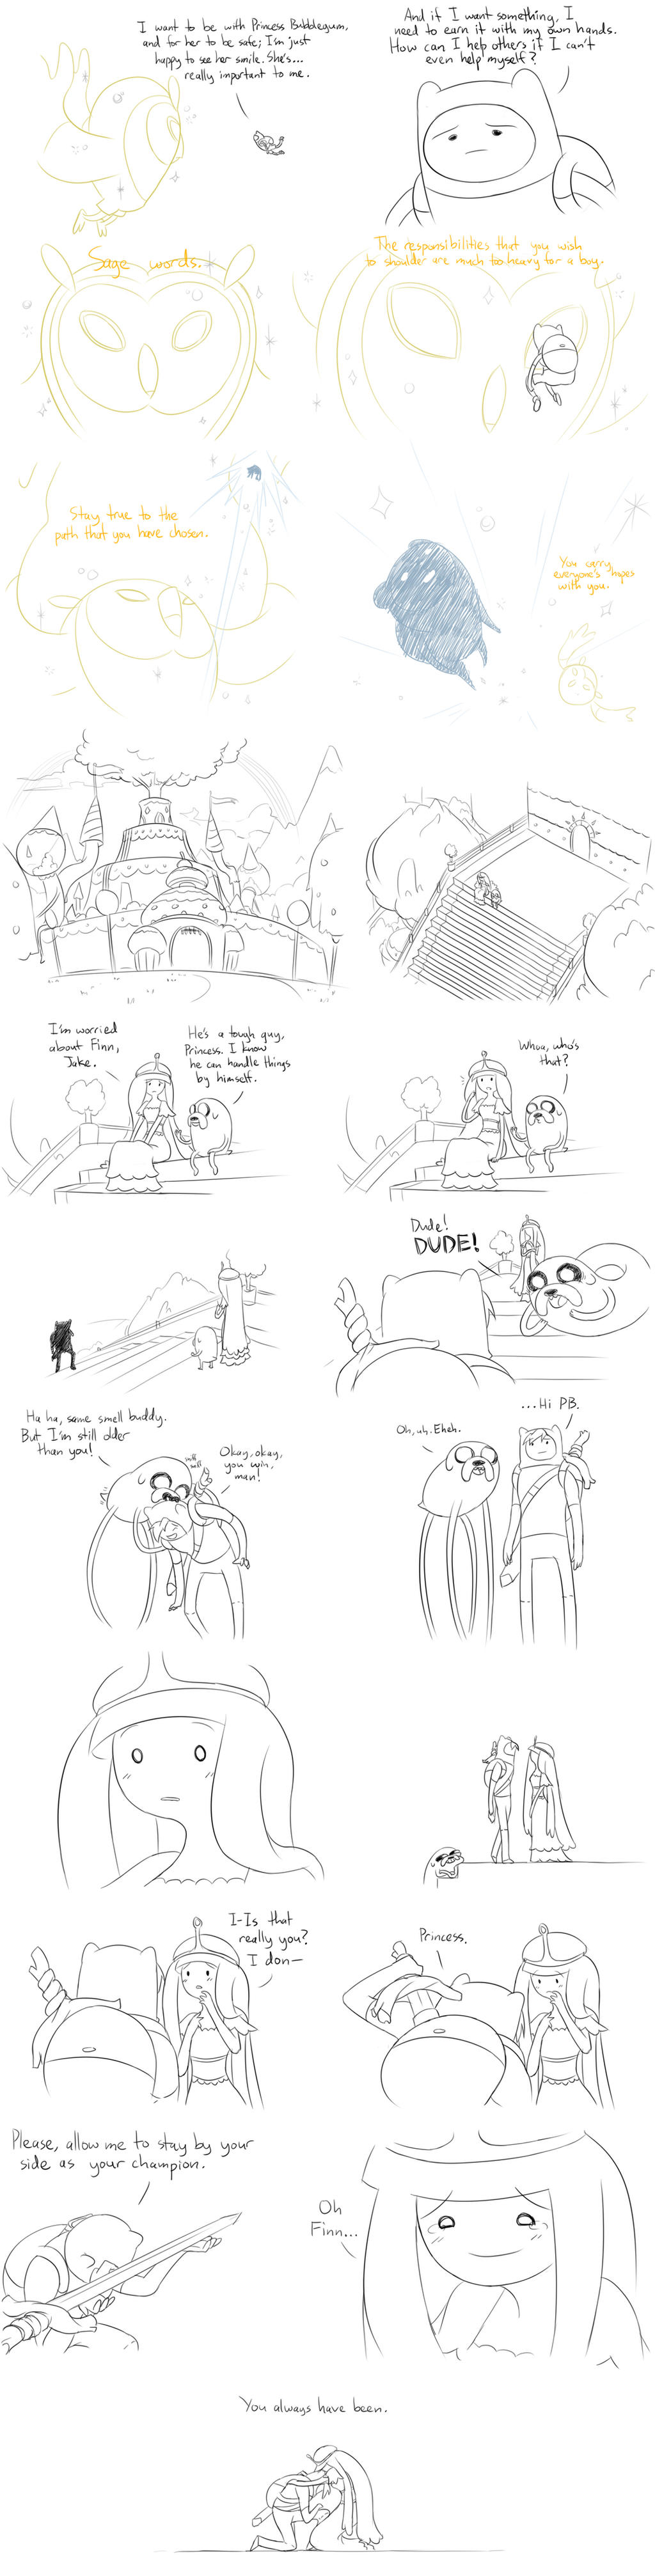 Wizard's Steps: Good End by Matsu-sensei